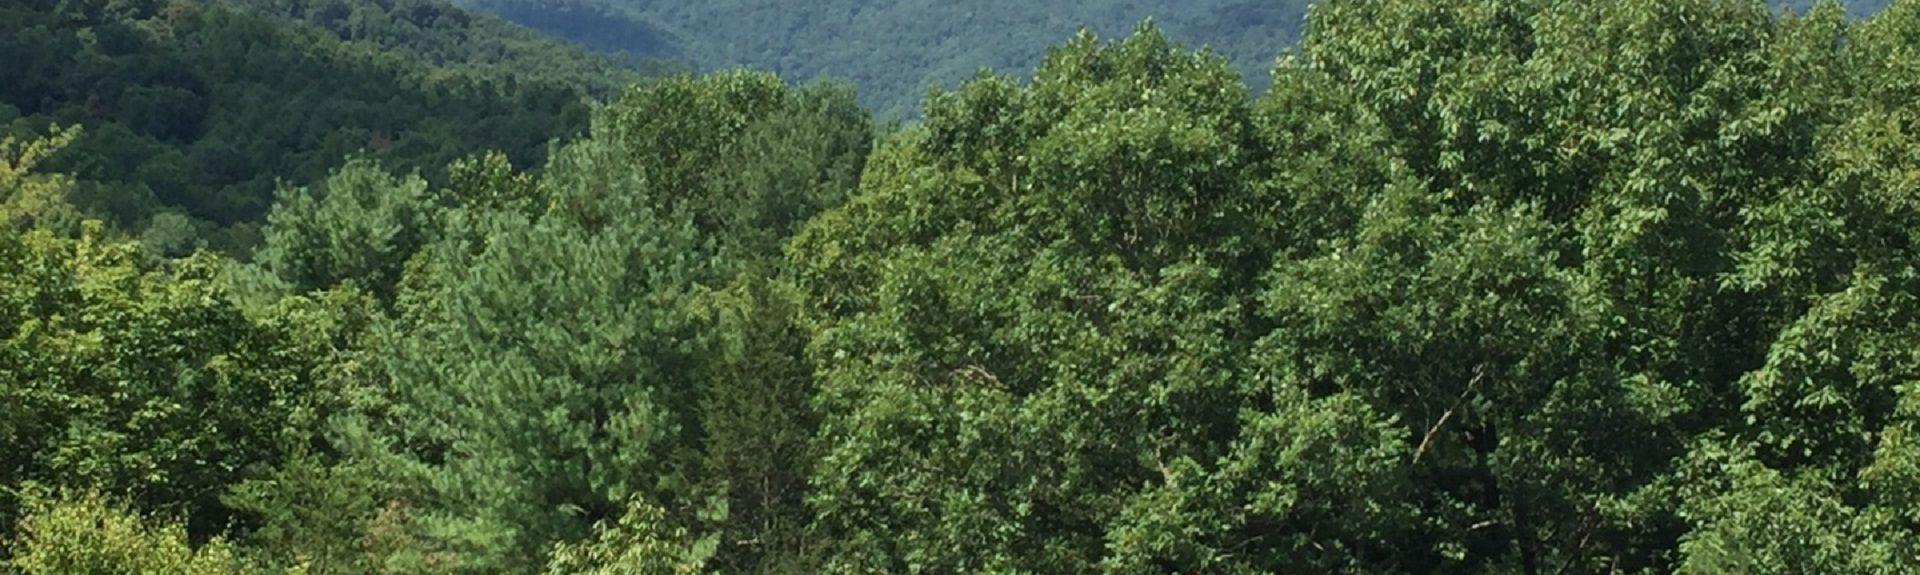 Crozet, Virginia, Verenigde Staten